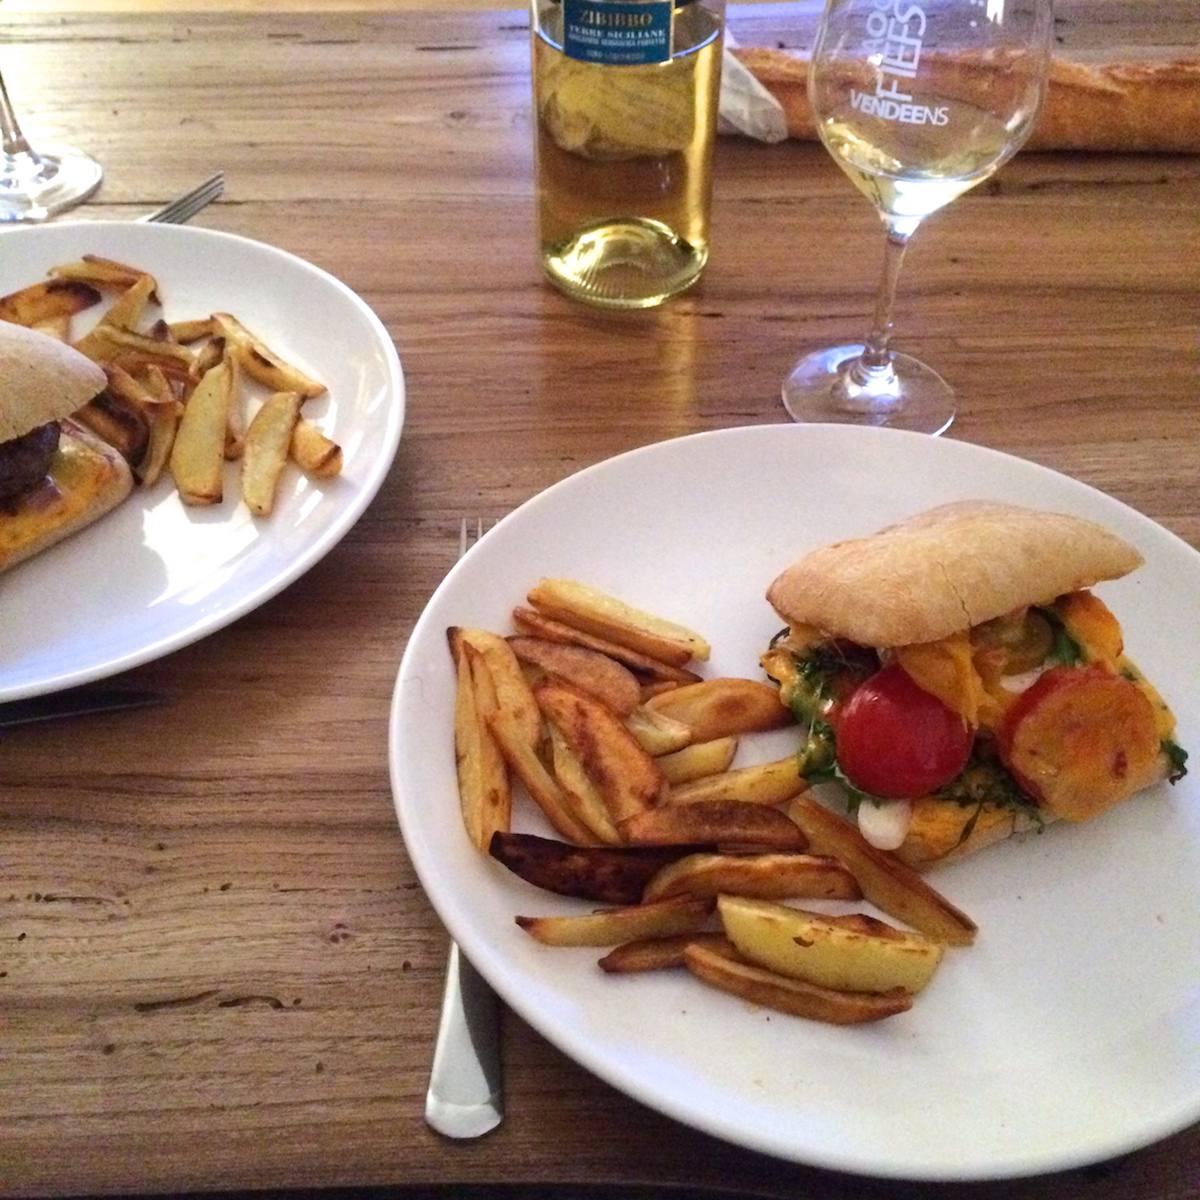 14 - Homemade - Meilleur burger nantes